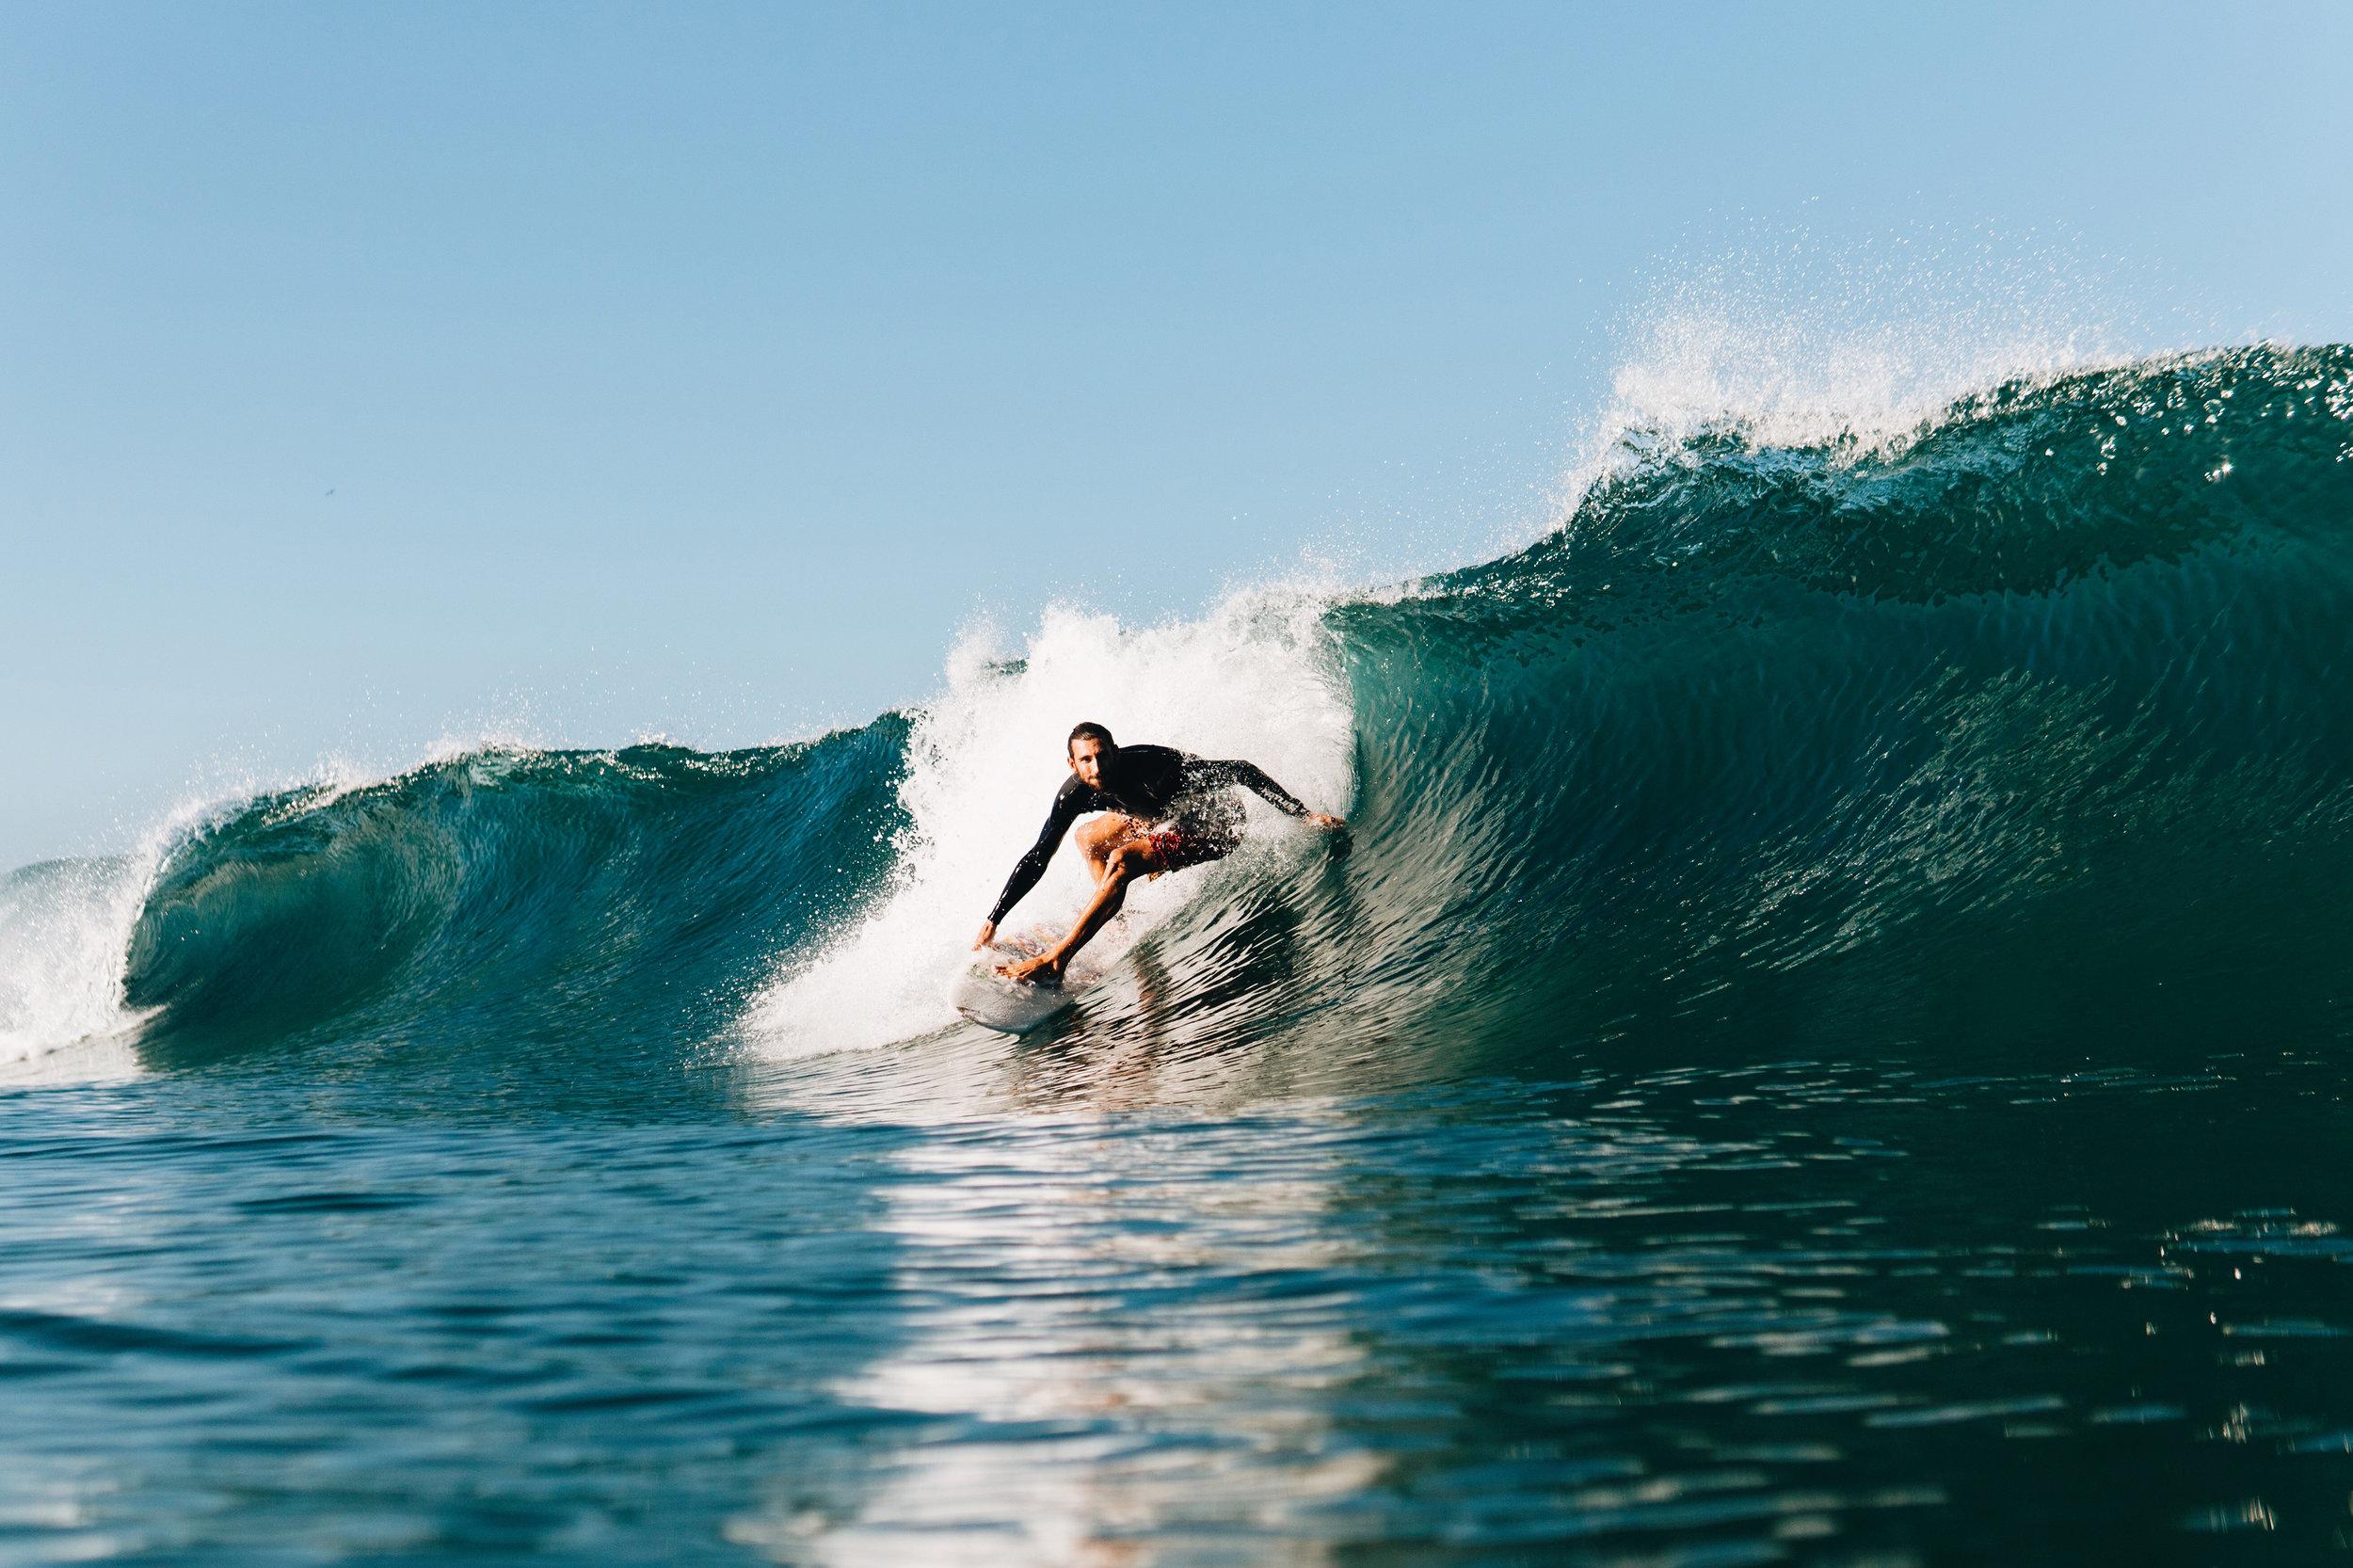 Sayulita-Mexico-Surf-Diego-Cadena-Kalle-Carranza-Dylan-Southworth-Gato-Rodriguez-Julien-Dorian-Gomez-Heiko-Bothe-22.JPG